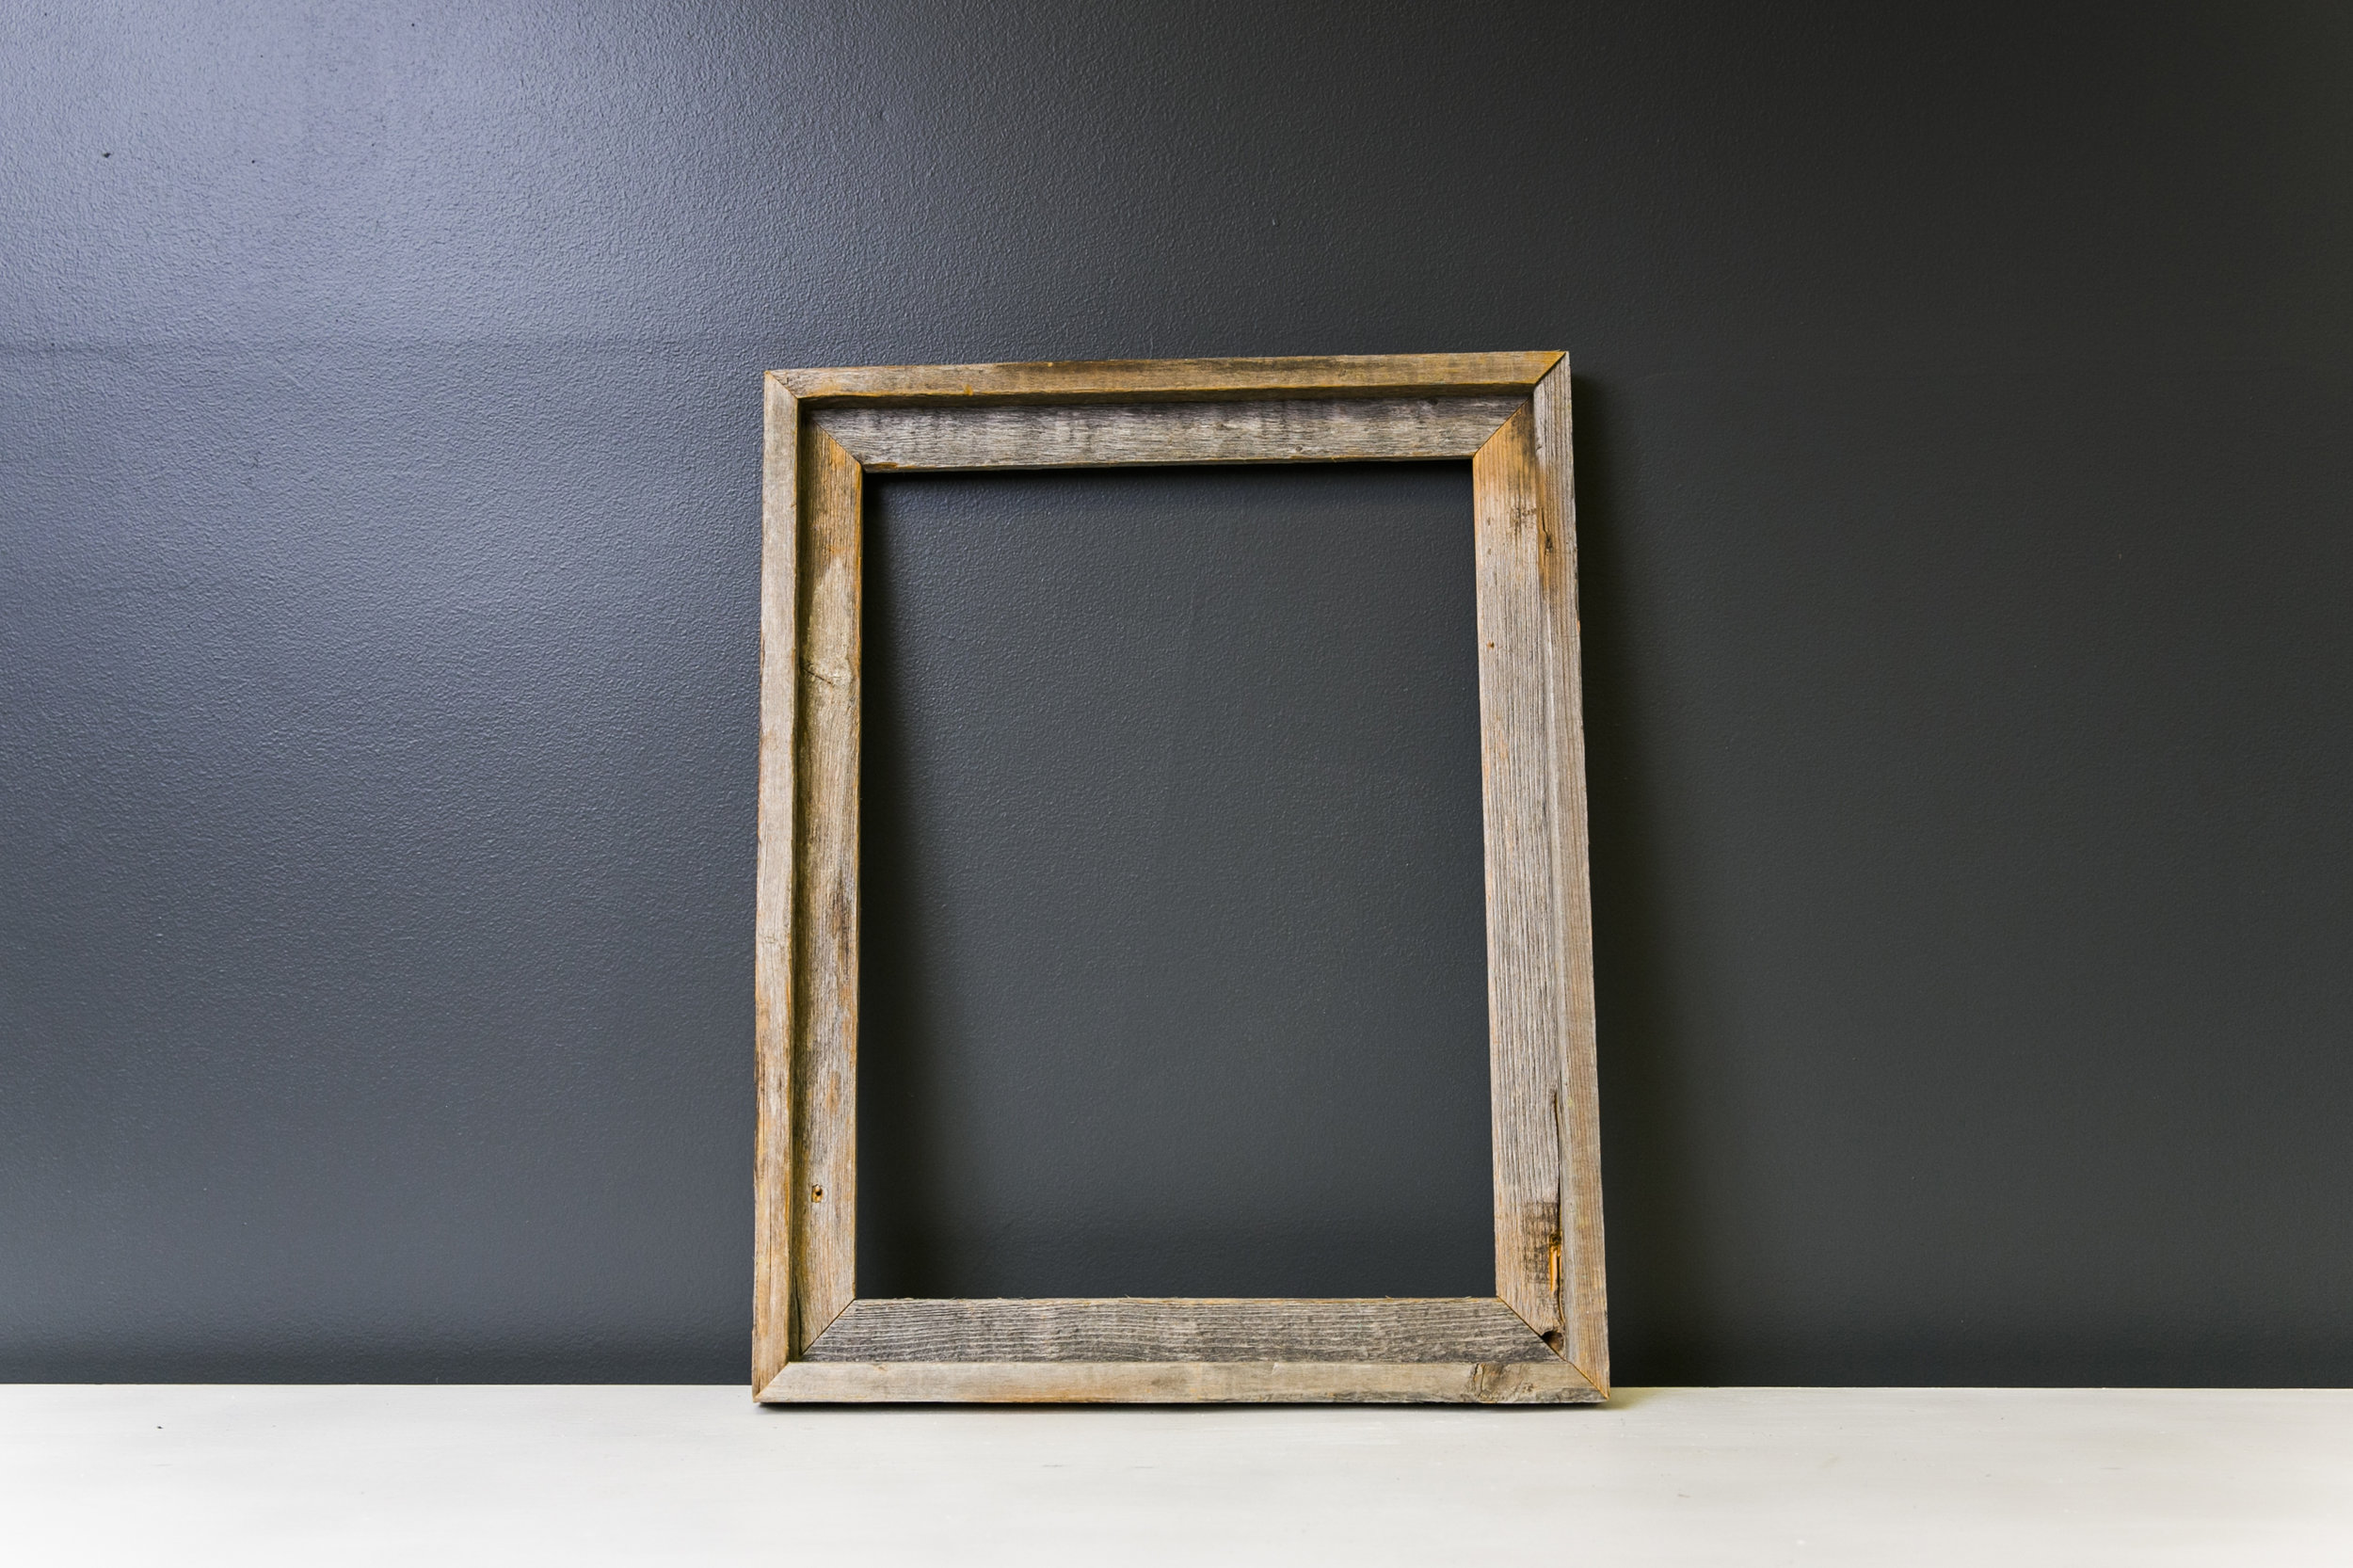 Arlington Rustic Frame 19 x 15.